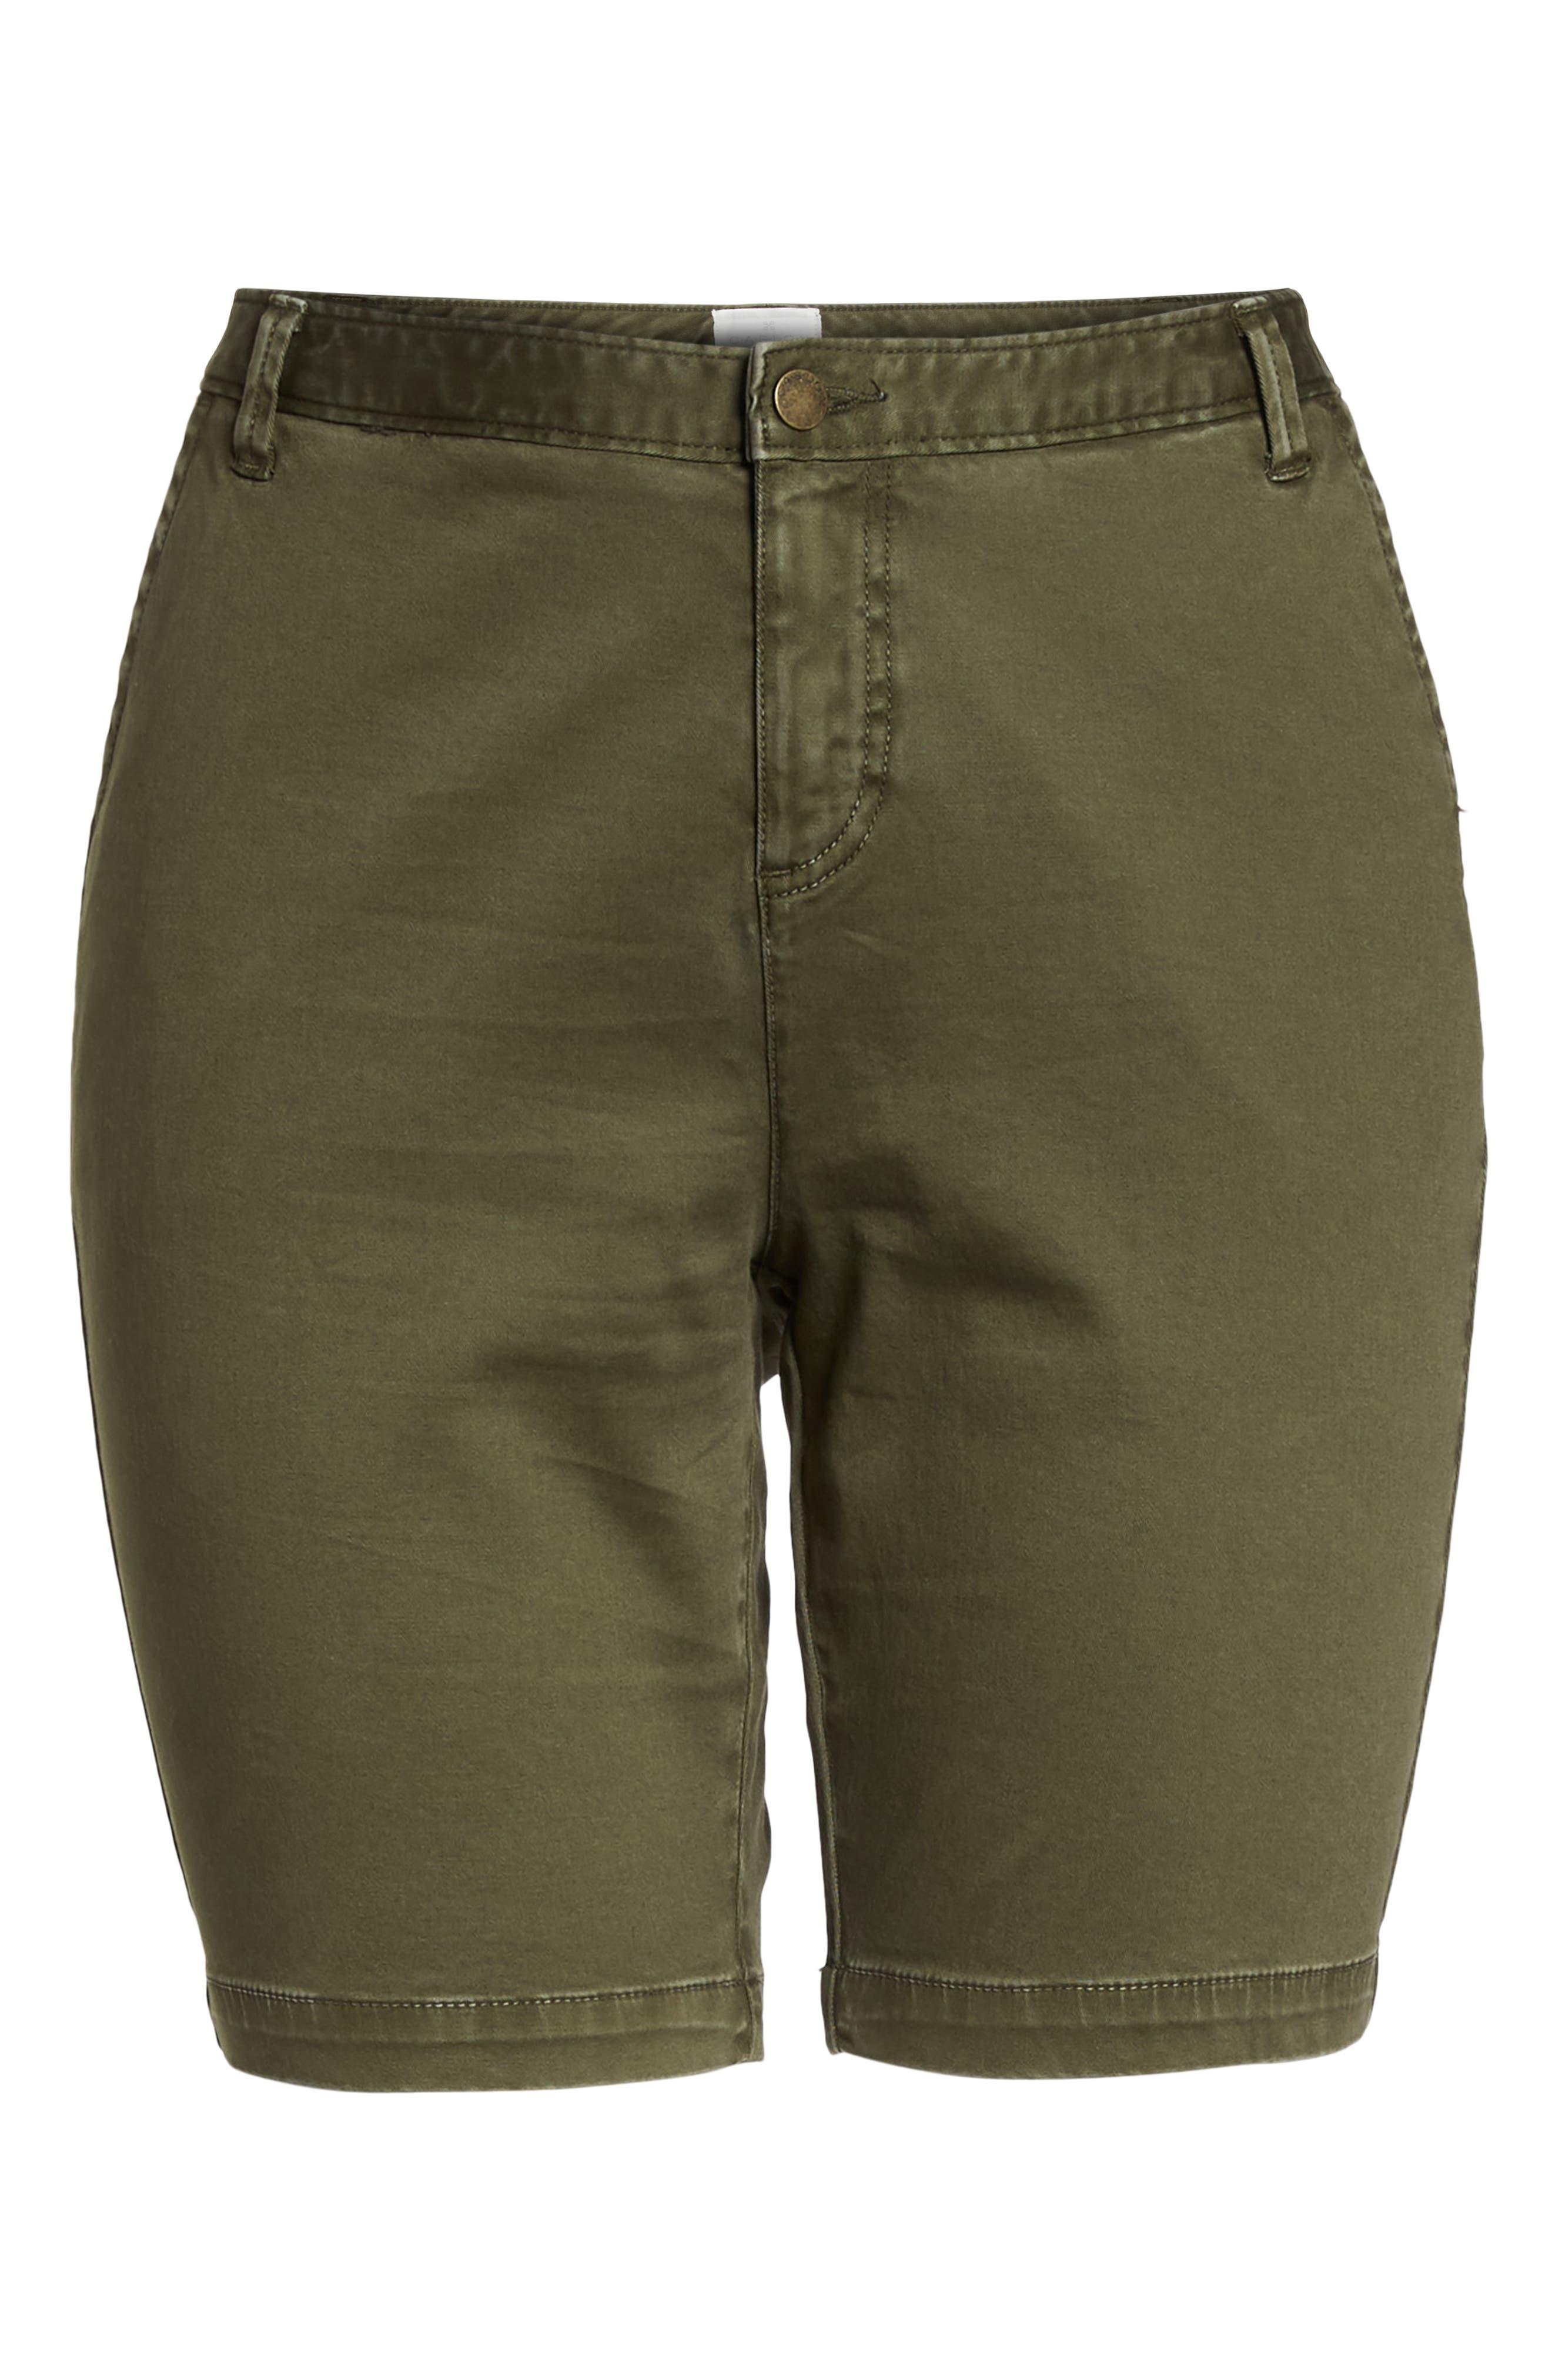 Twill Shorts,                             Alternate thumbnail 7, color,                             Olive Sarma